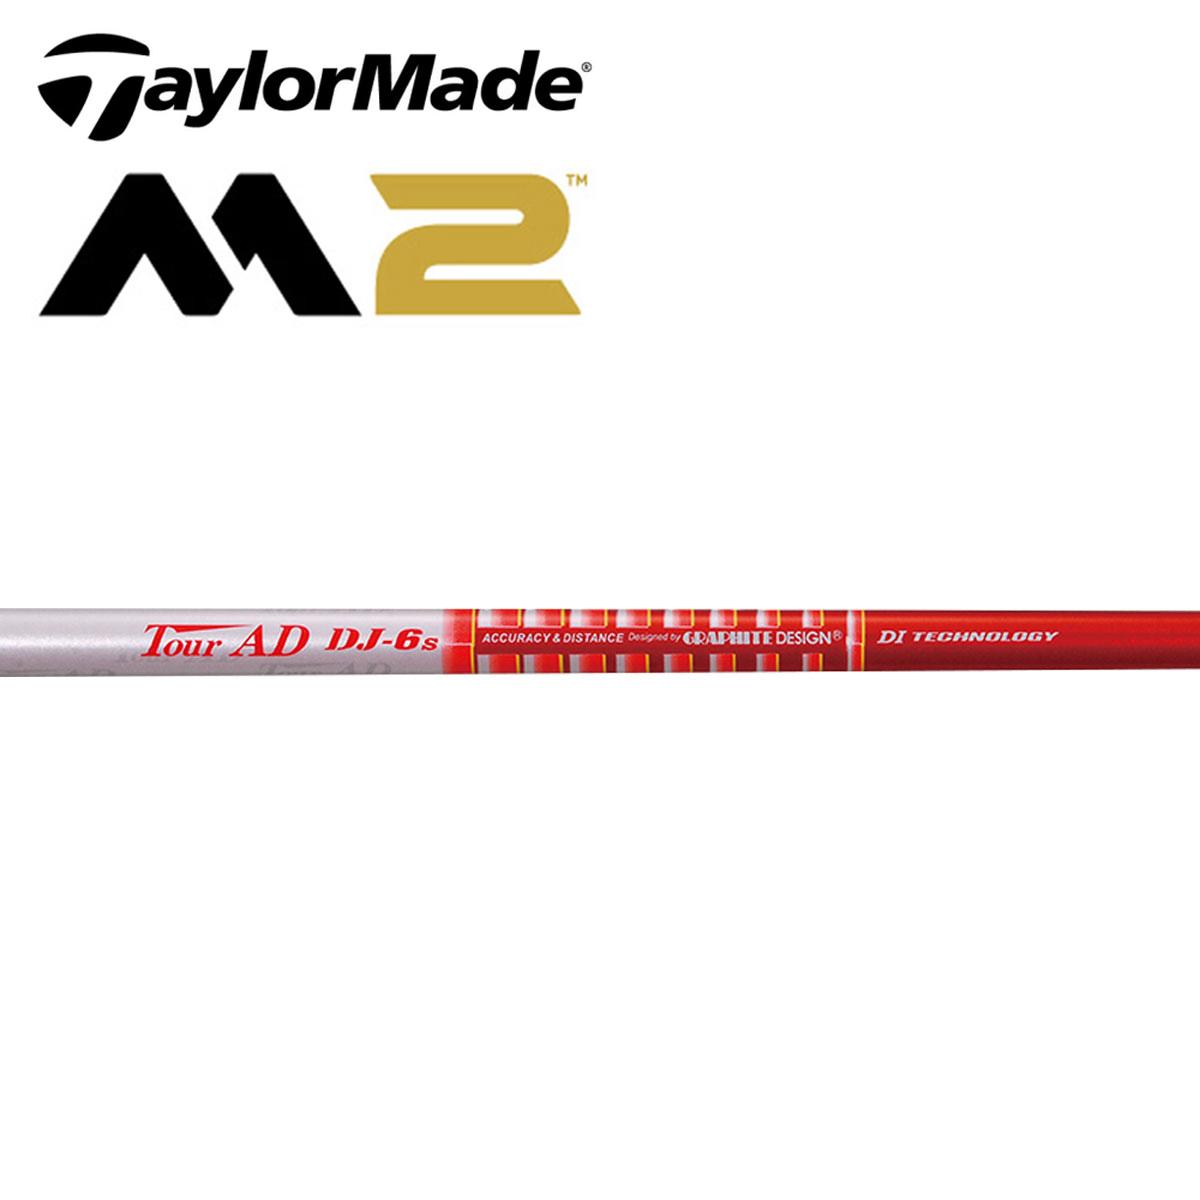 Tour AD DJシリーズ M2 ドライバーロフト9.5度用スリーブ付きシャフト 2016年モデル【テーラーメイド専用】